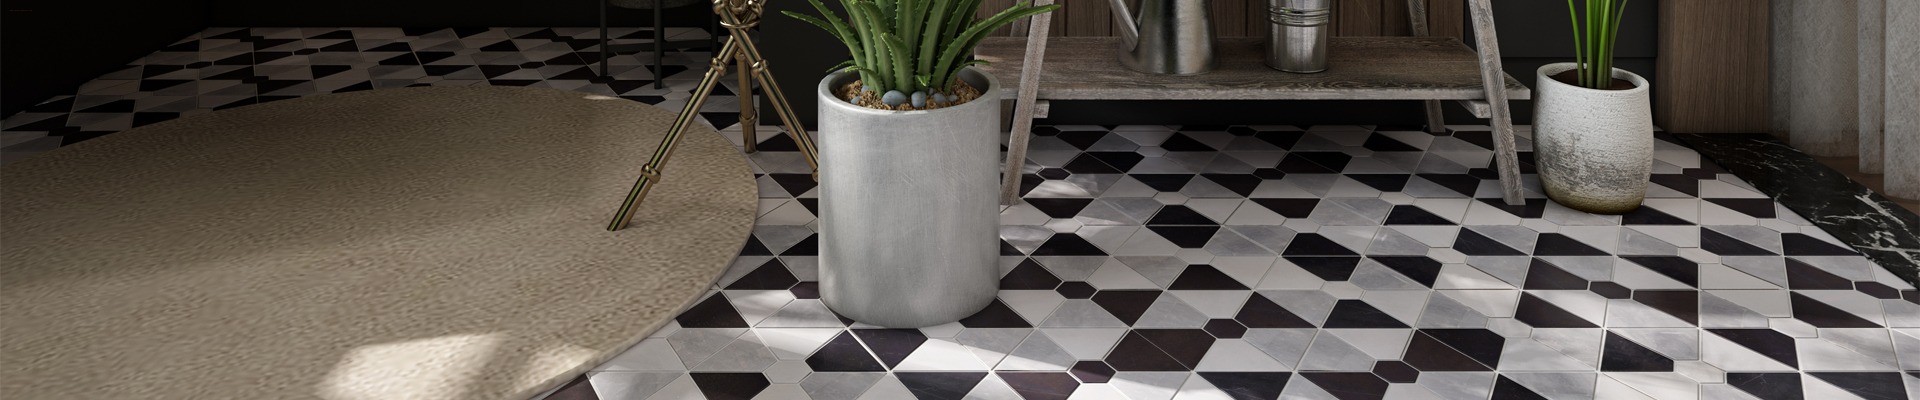 Heng Xing-Hexagon Combination Shape White Mixed Black Stone Mosaic Floor Tile